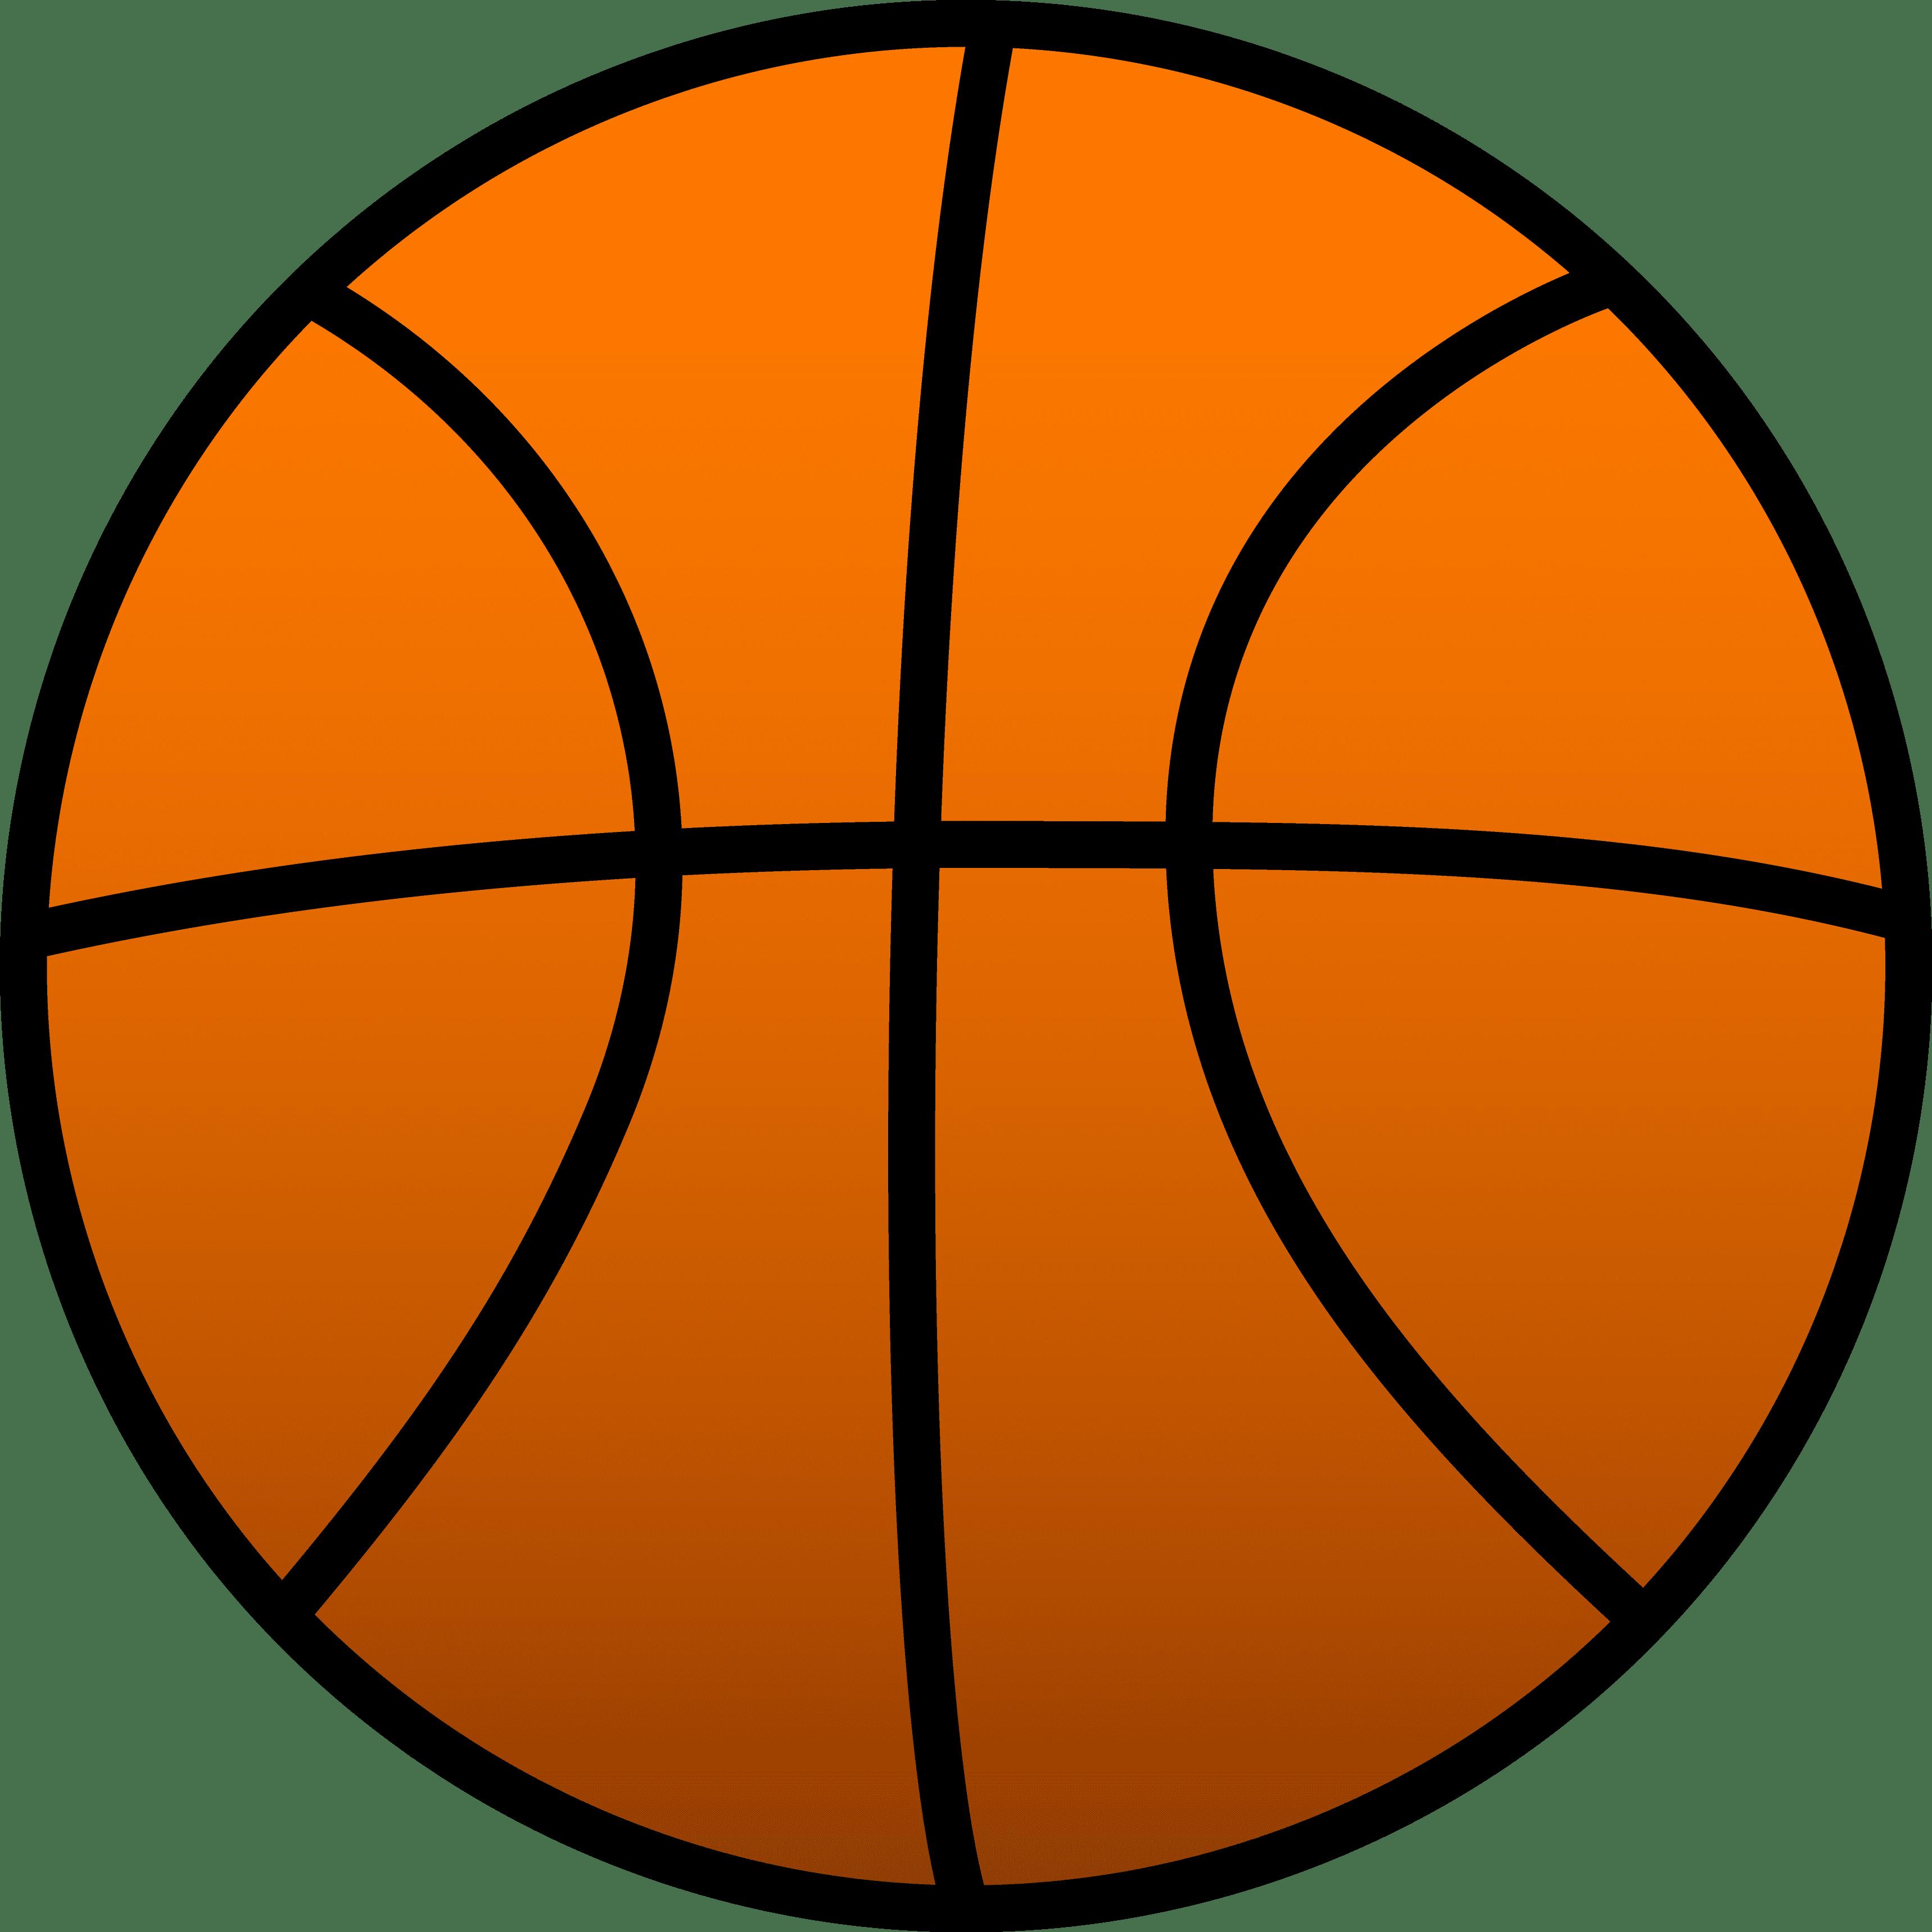 Clipart socks basket. Basketball png free images